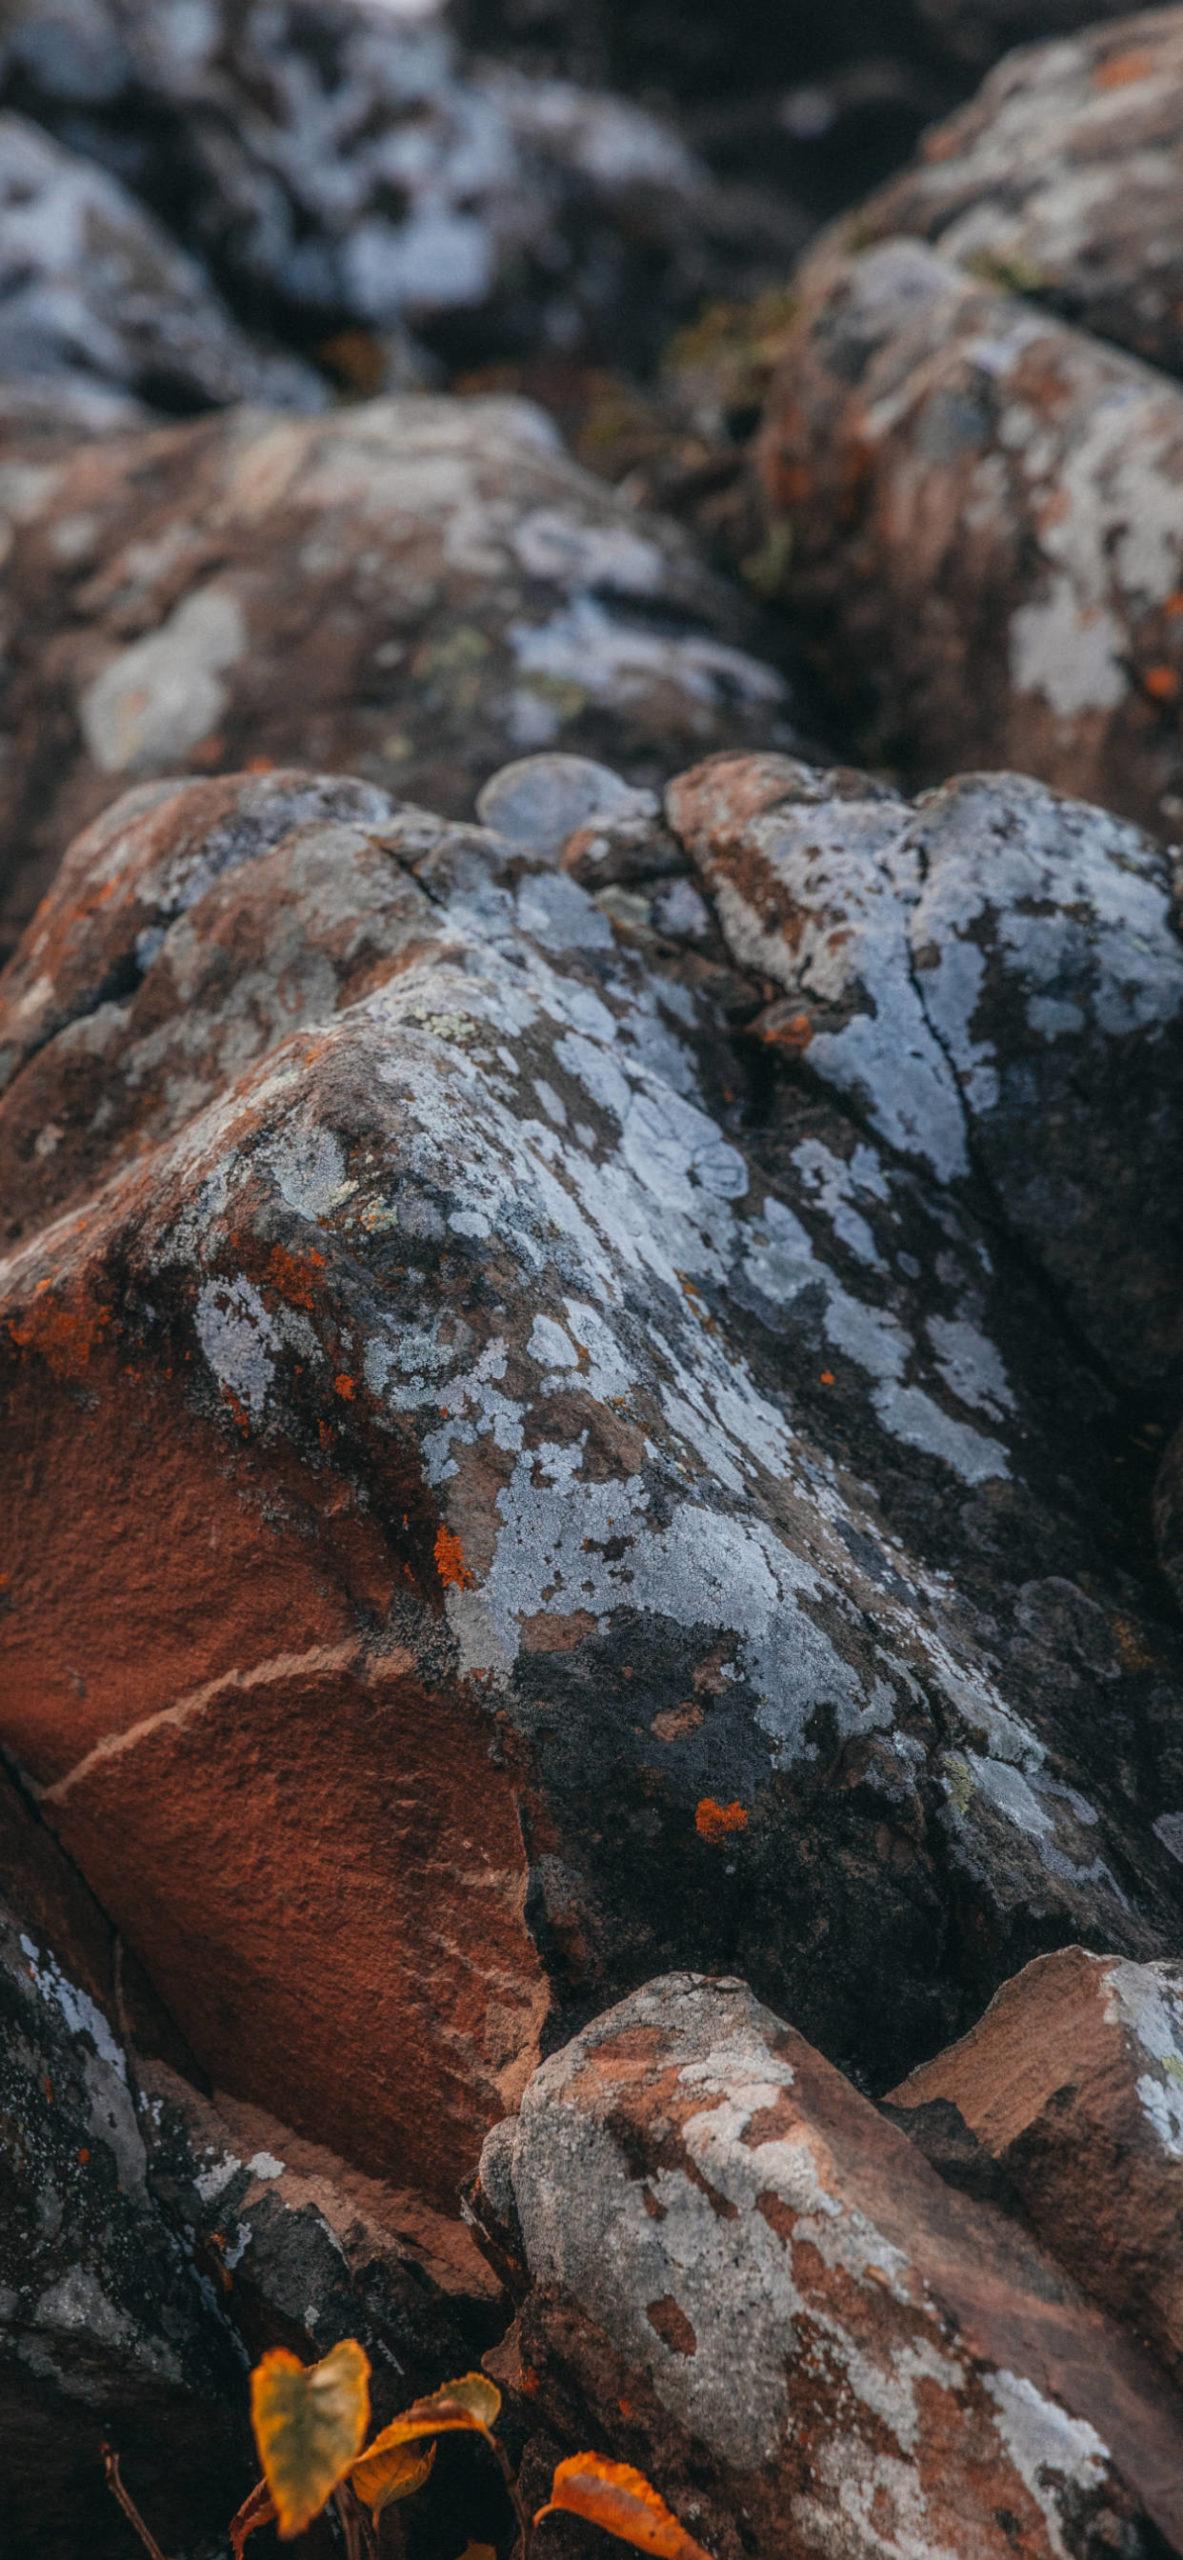 iPhone wallpapers textures rocks grey orange scaled Textures